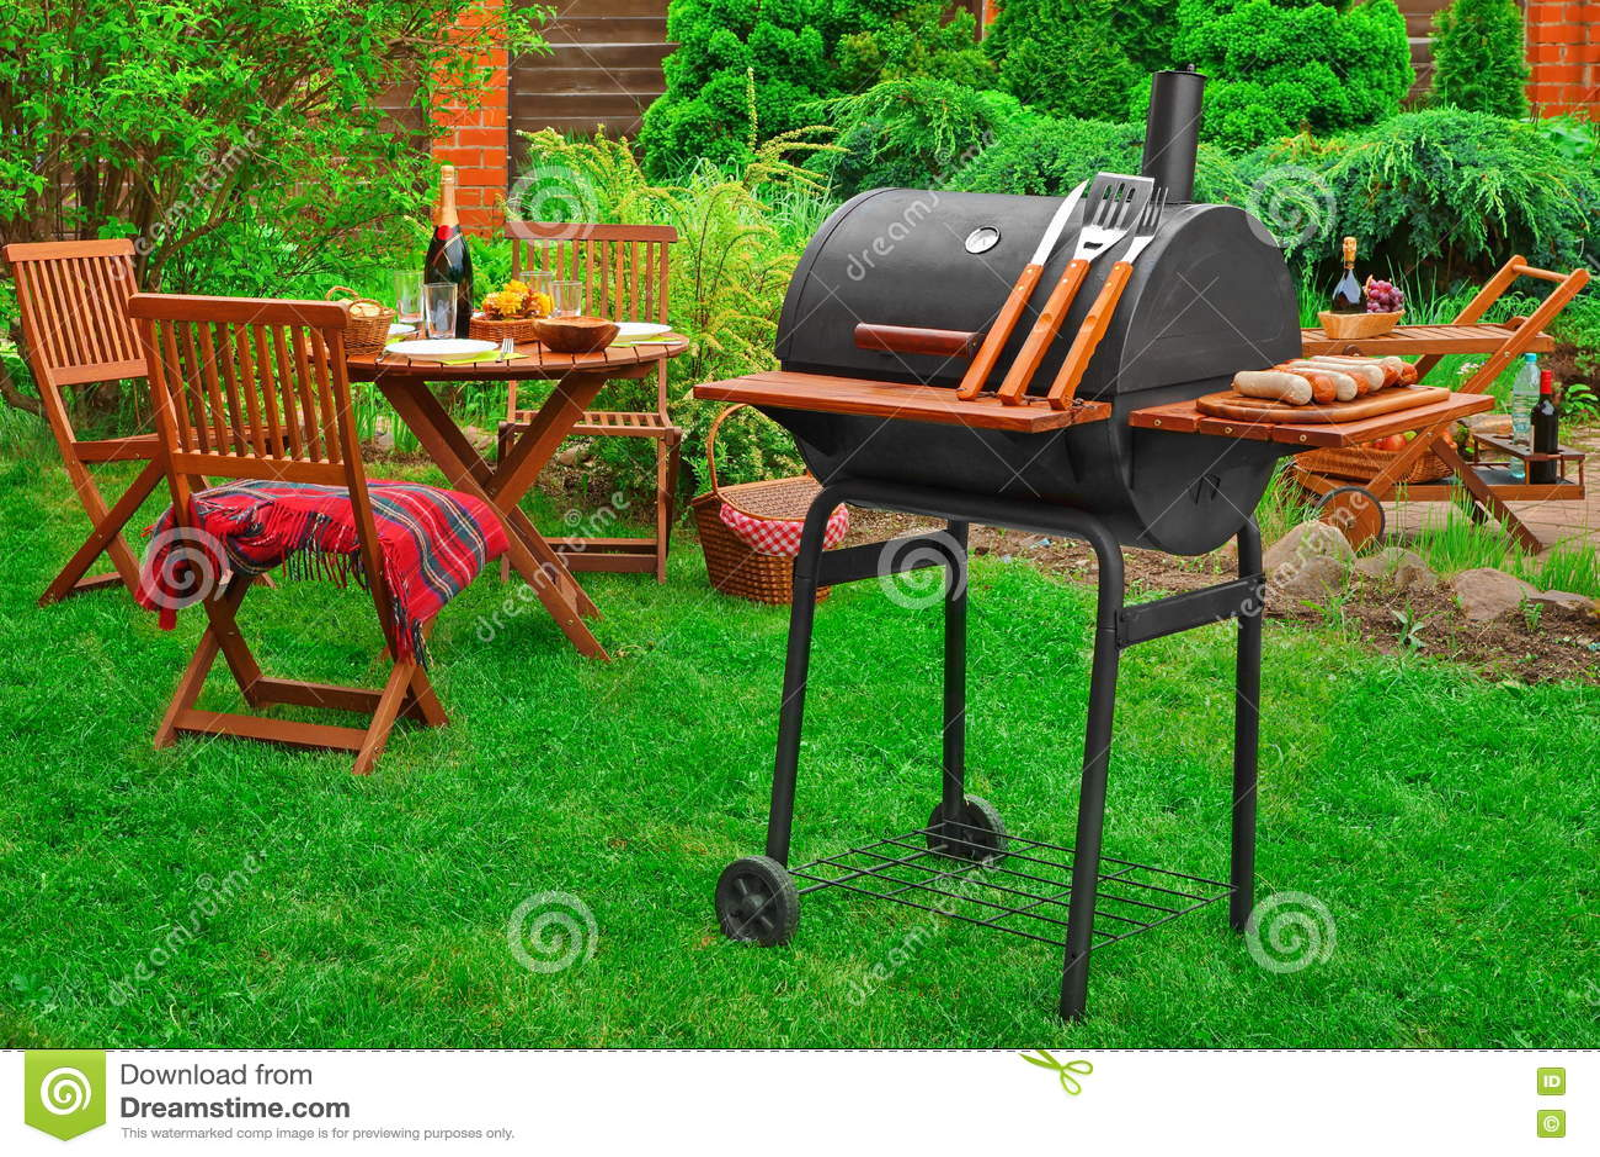 Partido del Bbq del fin de semana del verano o escena de la comida campestre en el césped